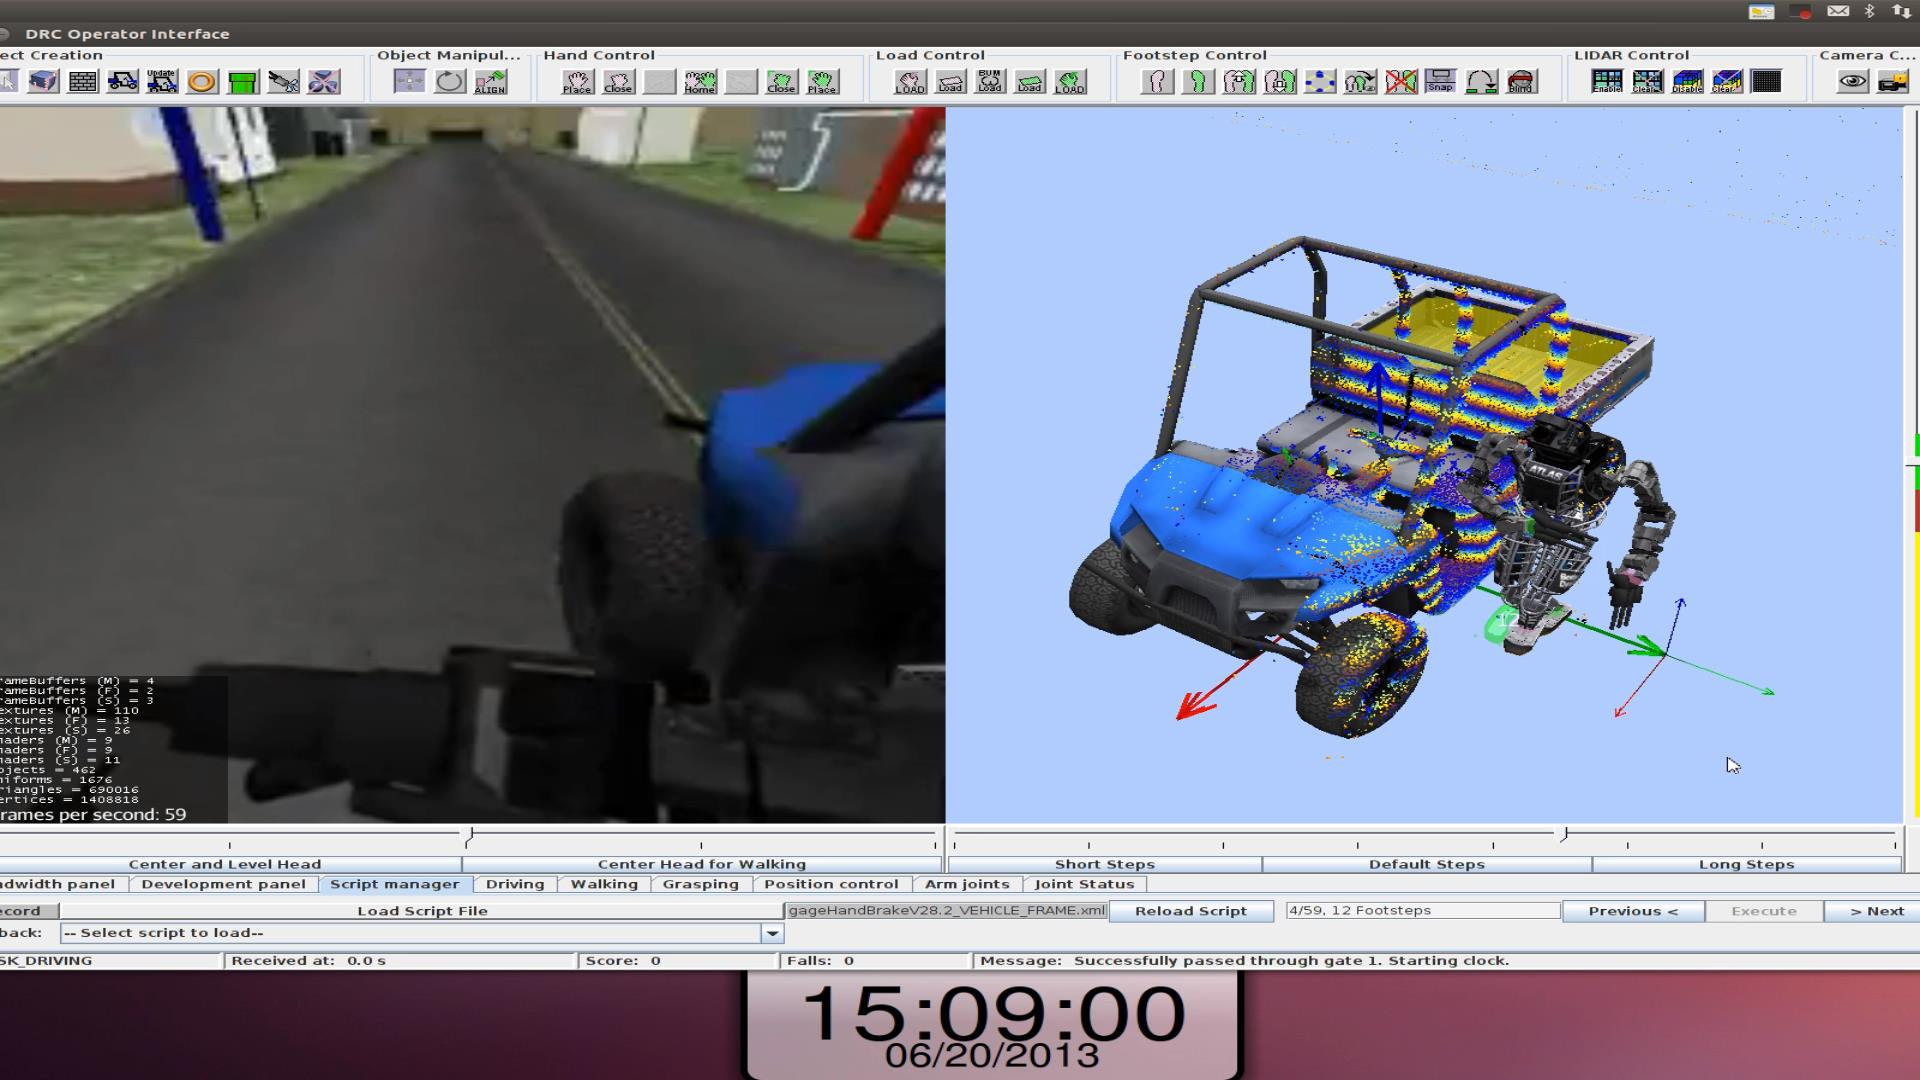 vrc_final_run14_driving (Subclip4).jpg